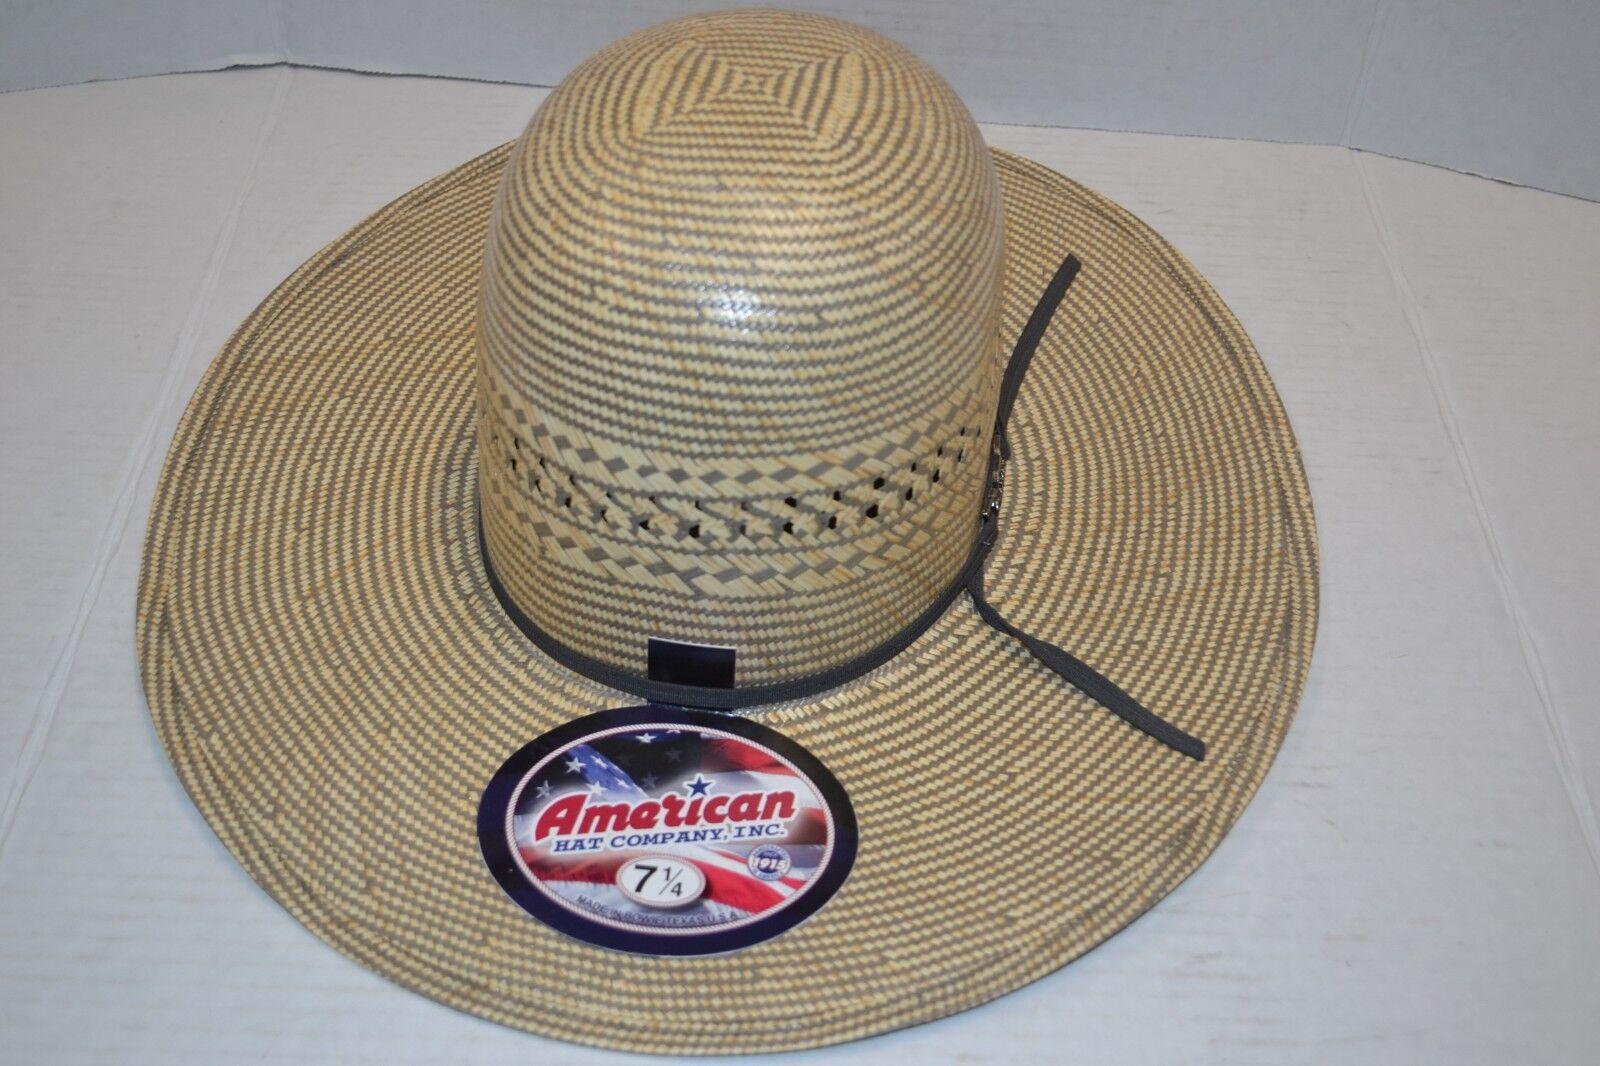 купить American Hat Company Cowboy Hat Cool Hand на Ebaycom из